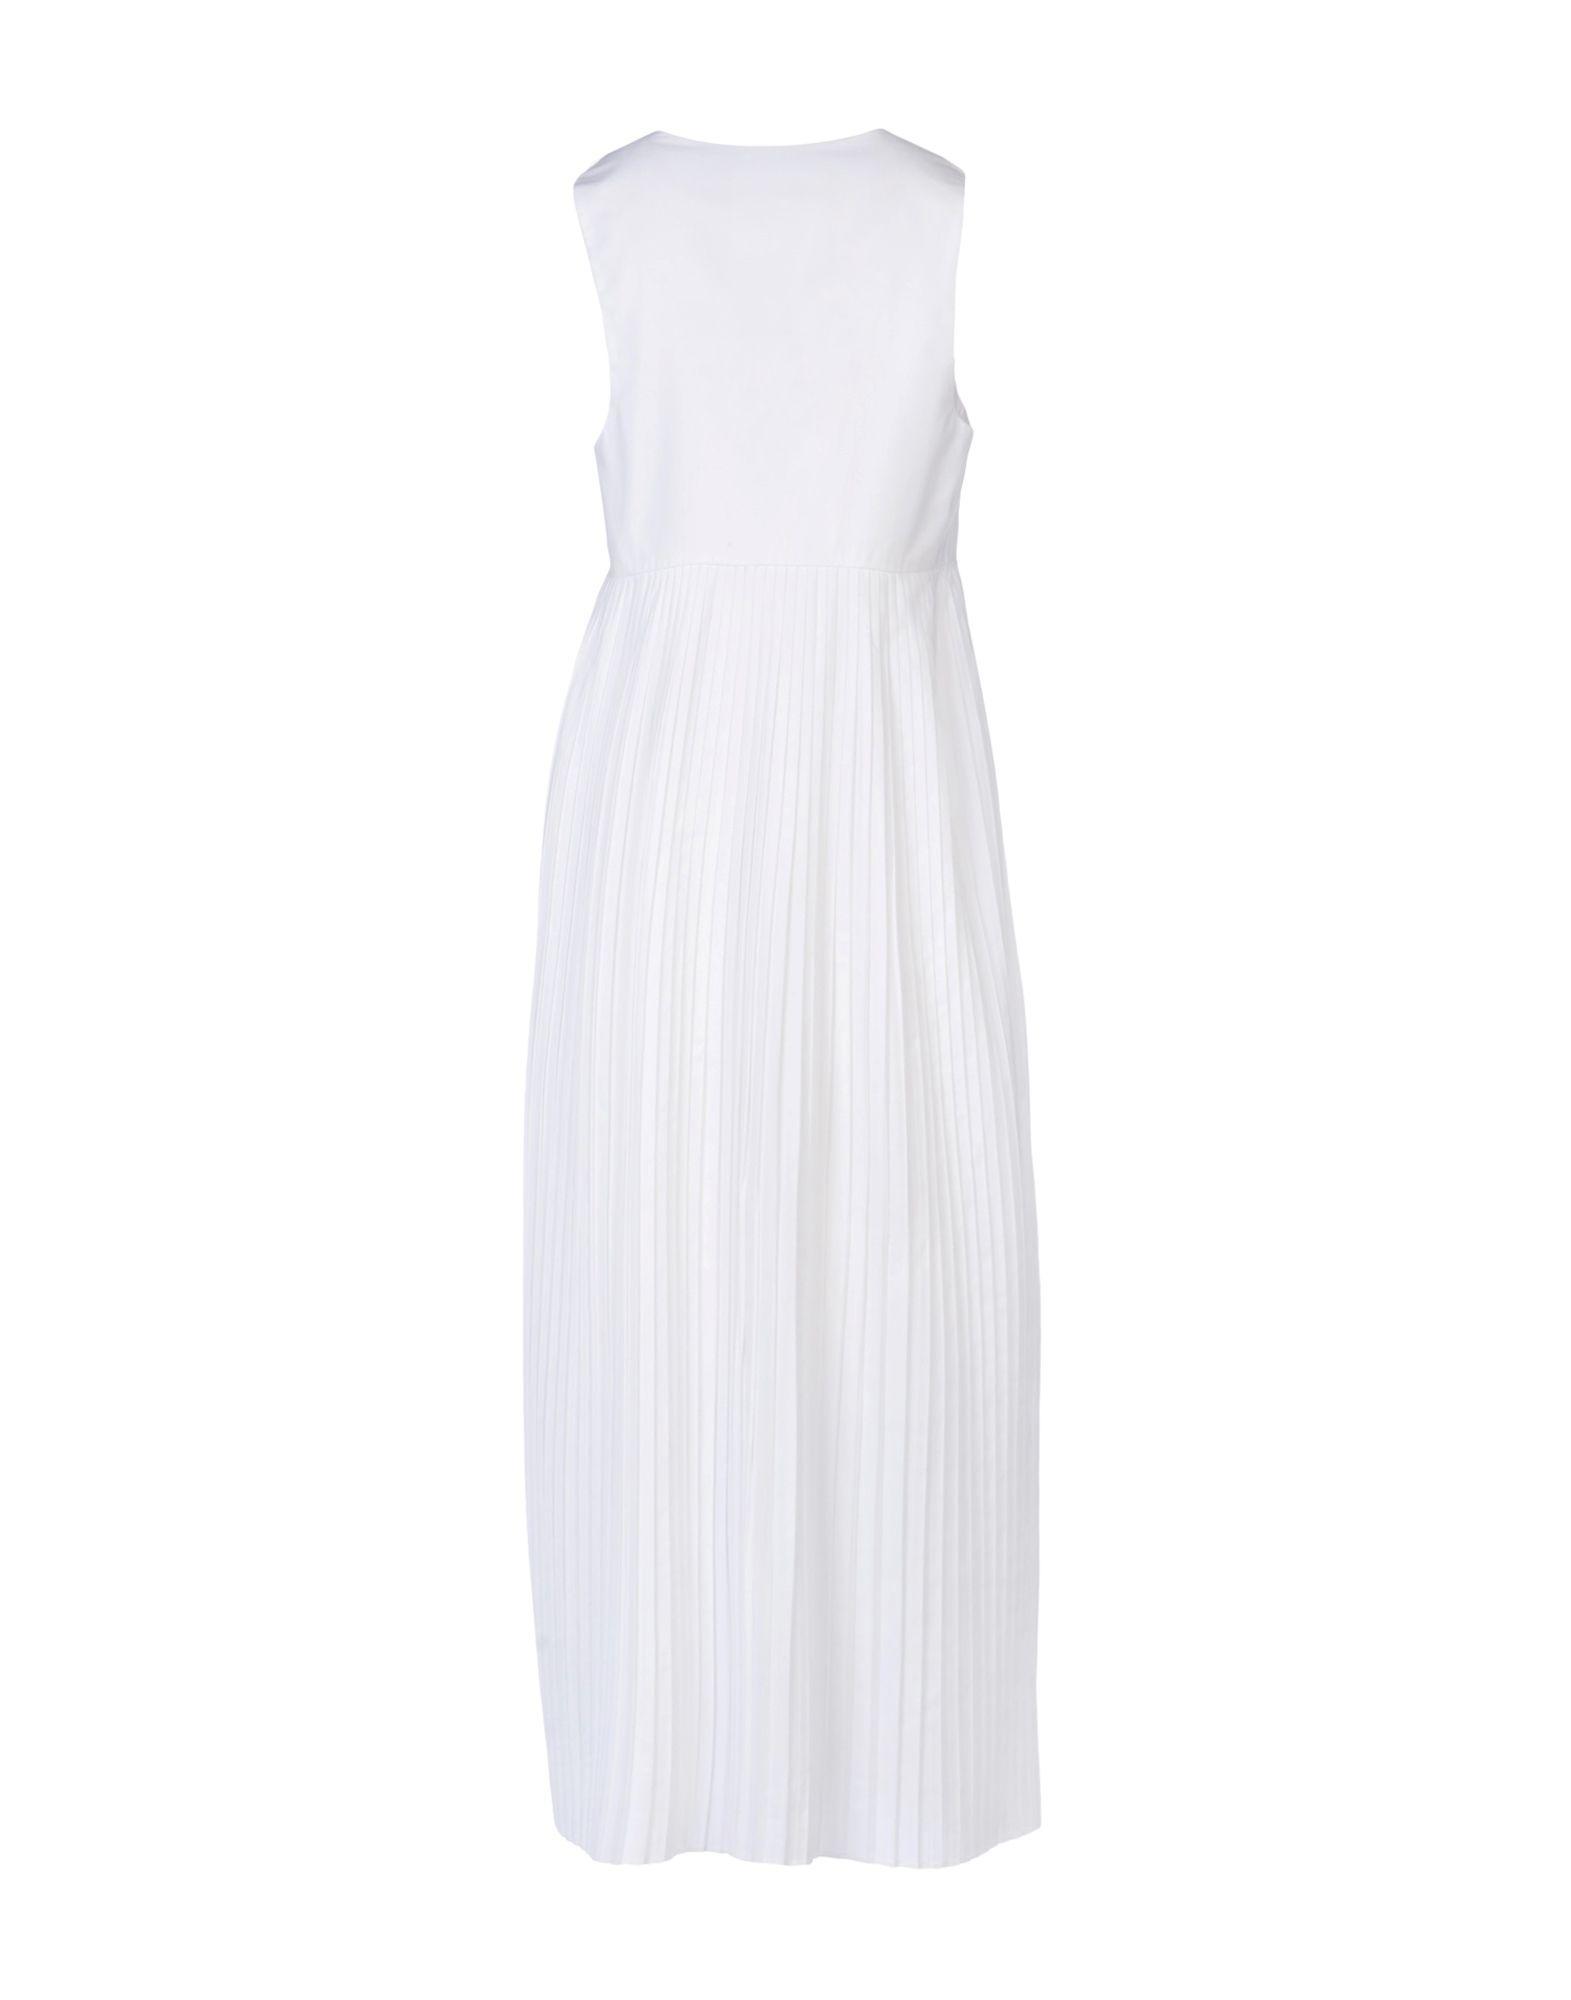 DRESSES - 3/4 length dresses Annarita N. Outlet Shopping Online ZgDPKk9Y2